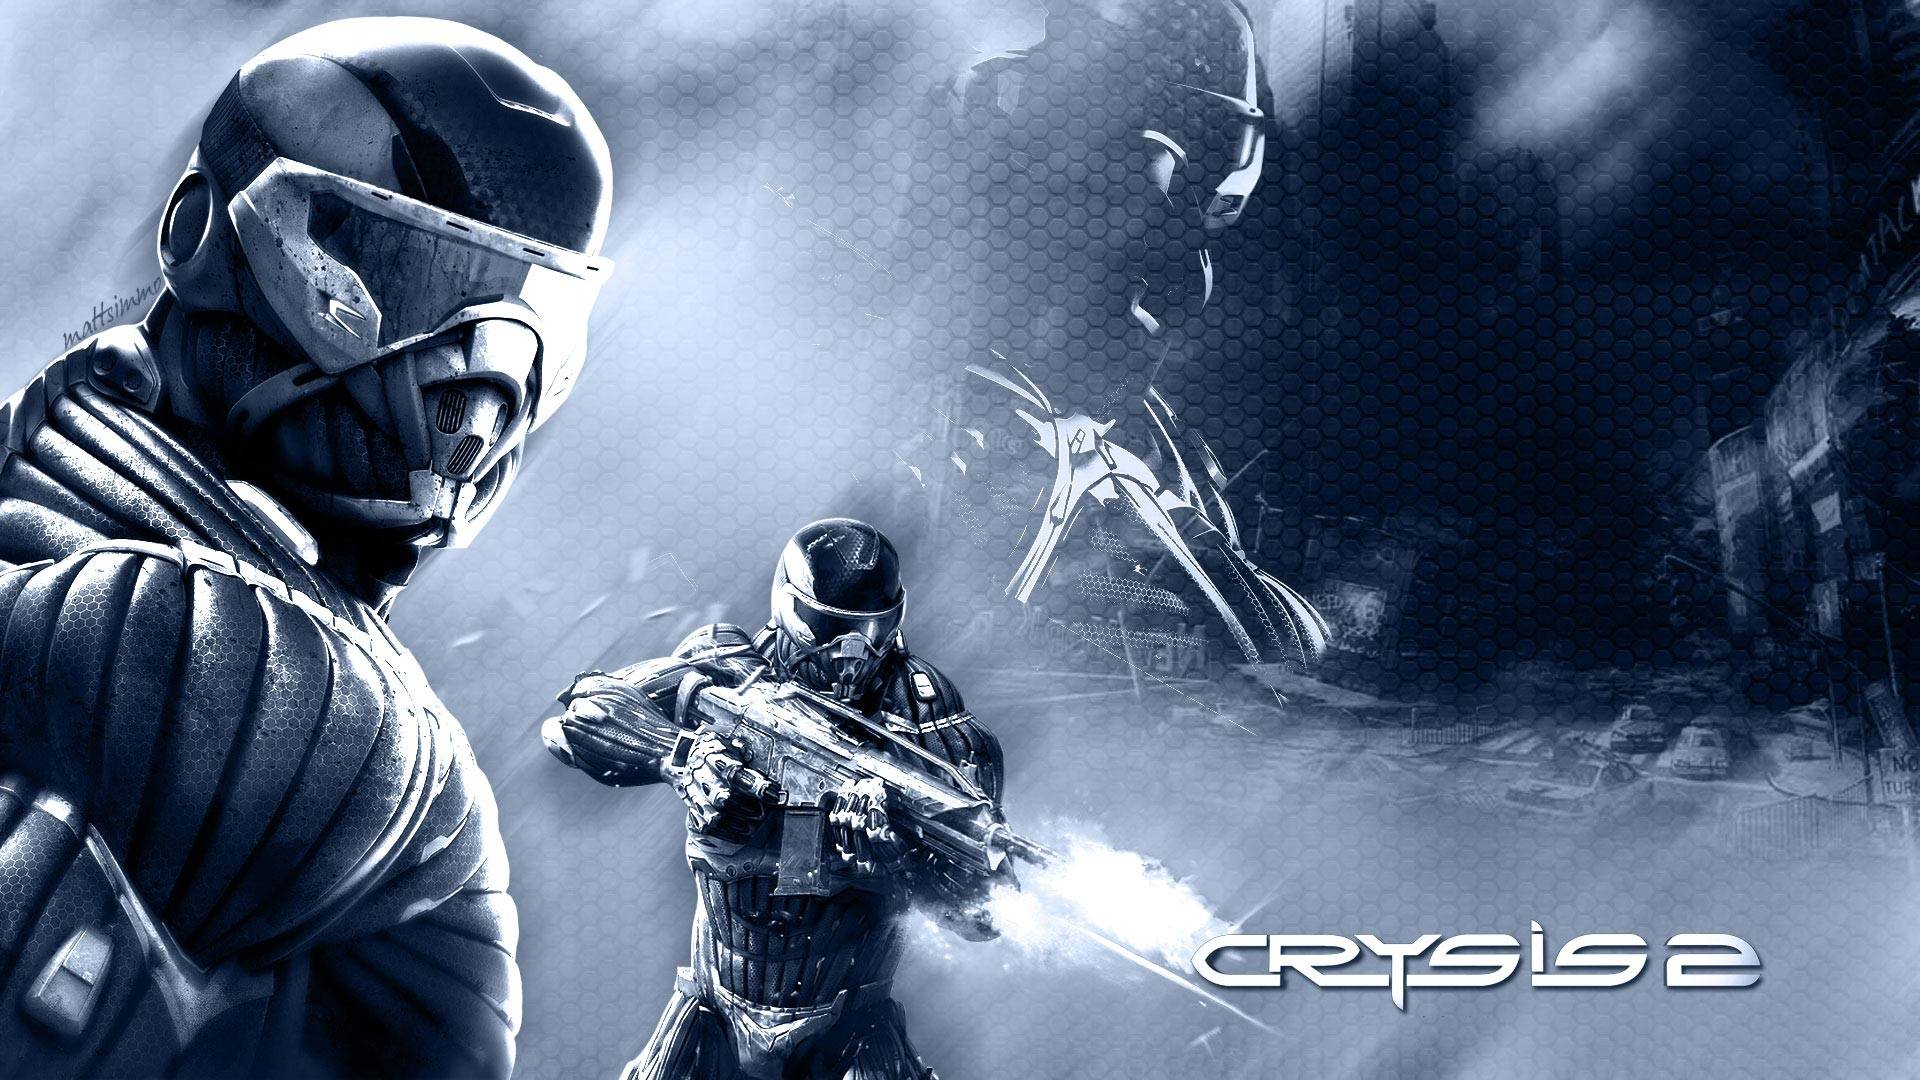 Crysis 2 Wallpapers in full 1080P HD GamingBoltcom Video Game 1920x1080